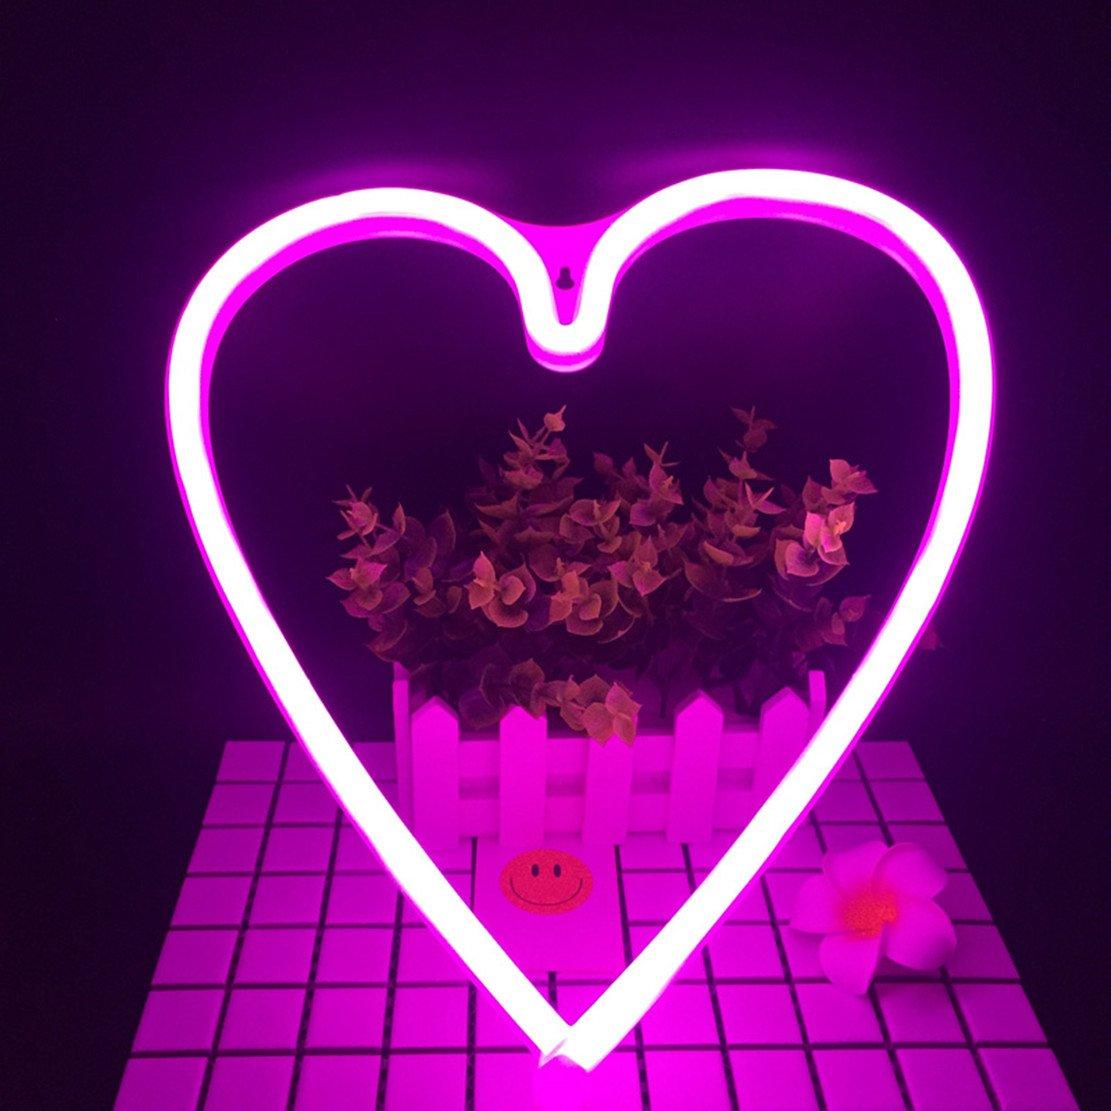 neon light led heart sign shaped decor light wall decor for